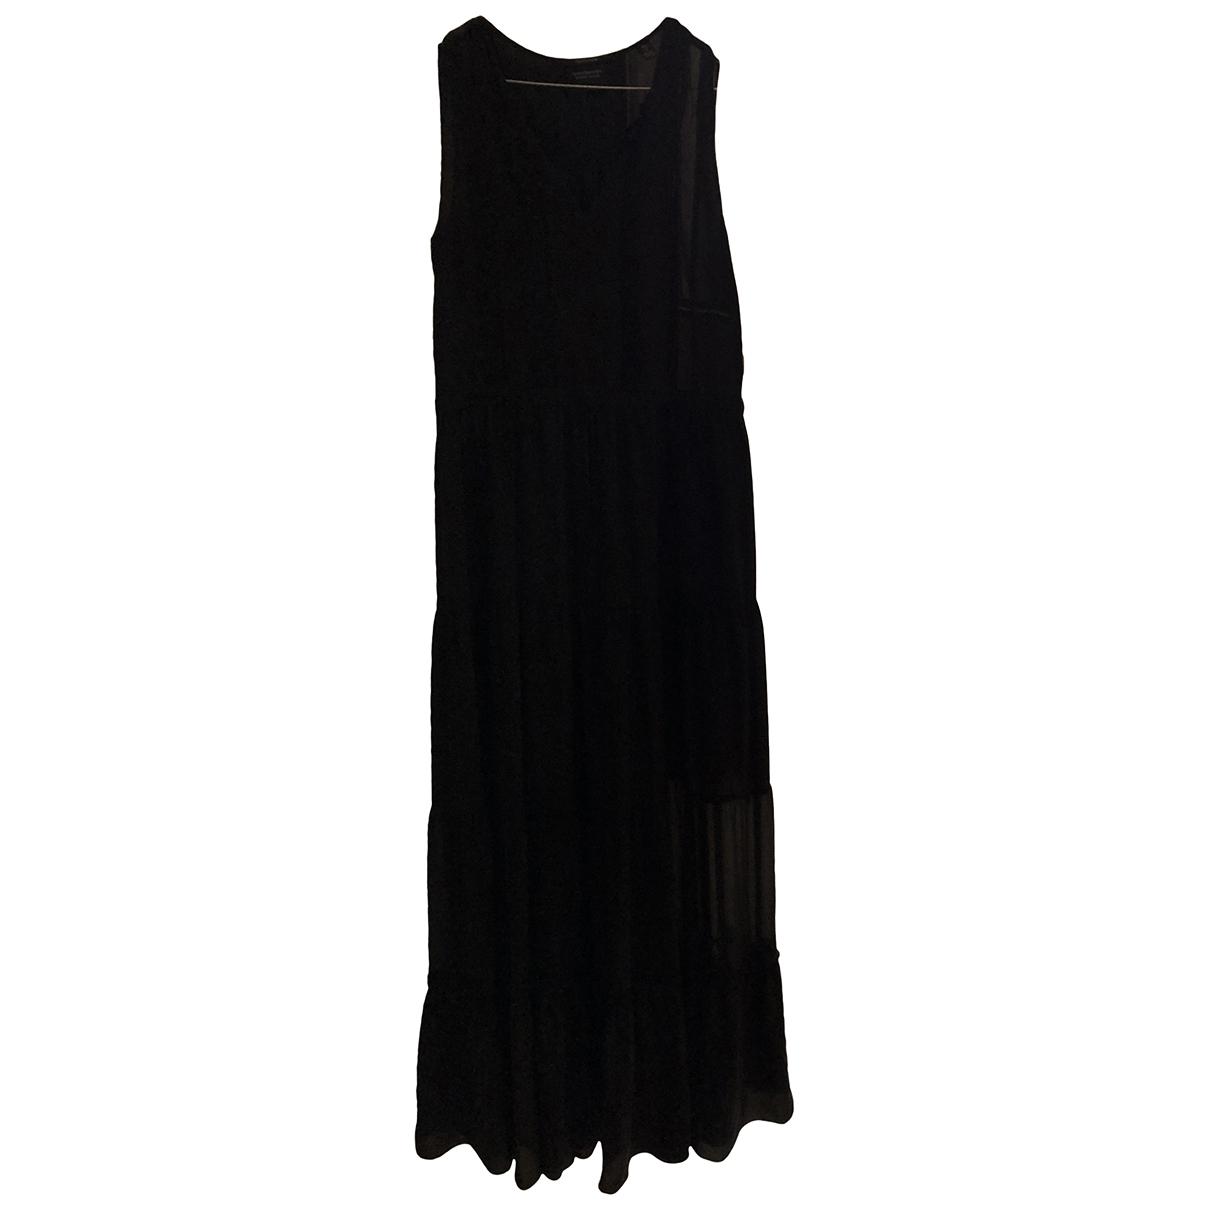 Scotch & Soda \N Black dress for Women 42 IT